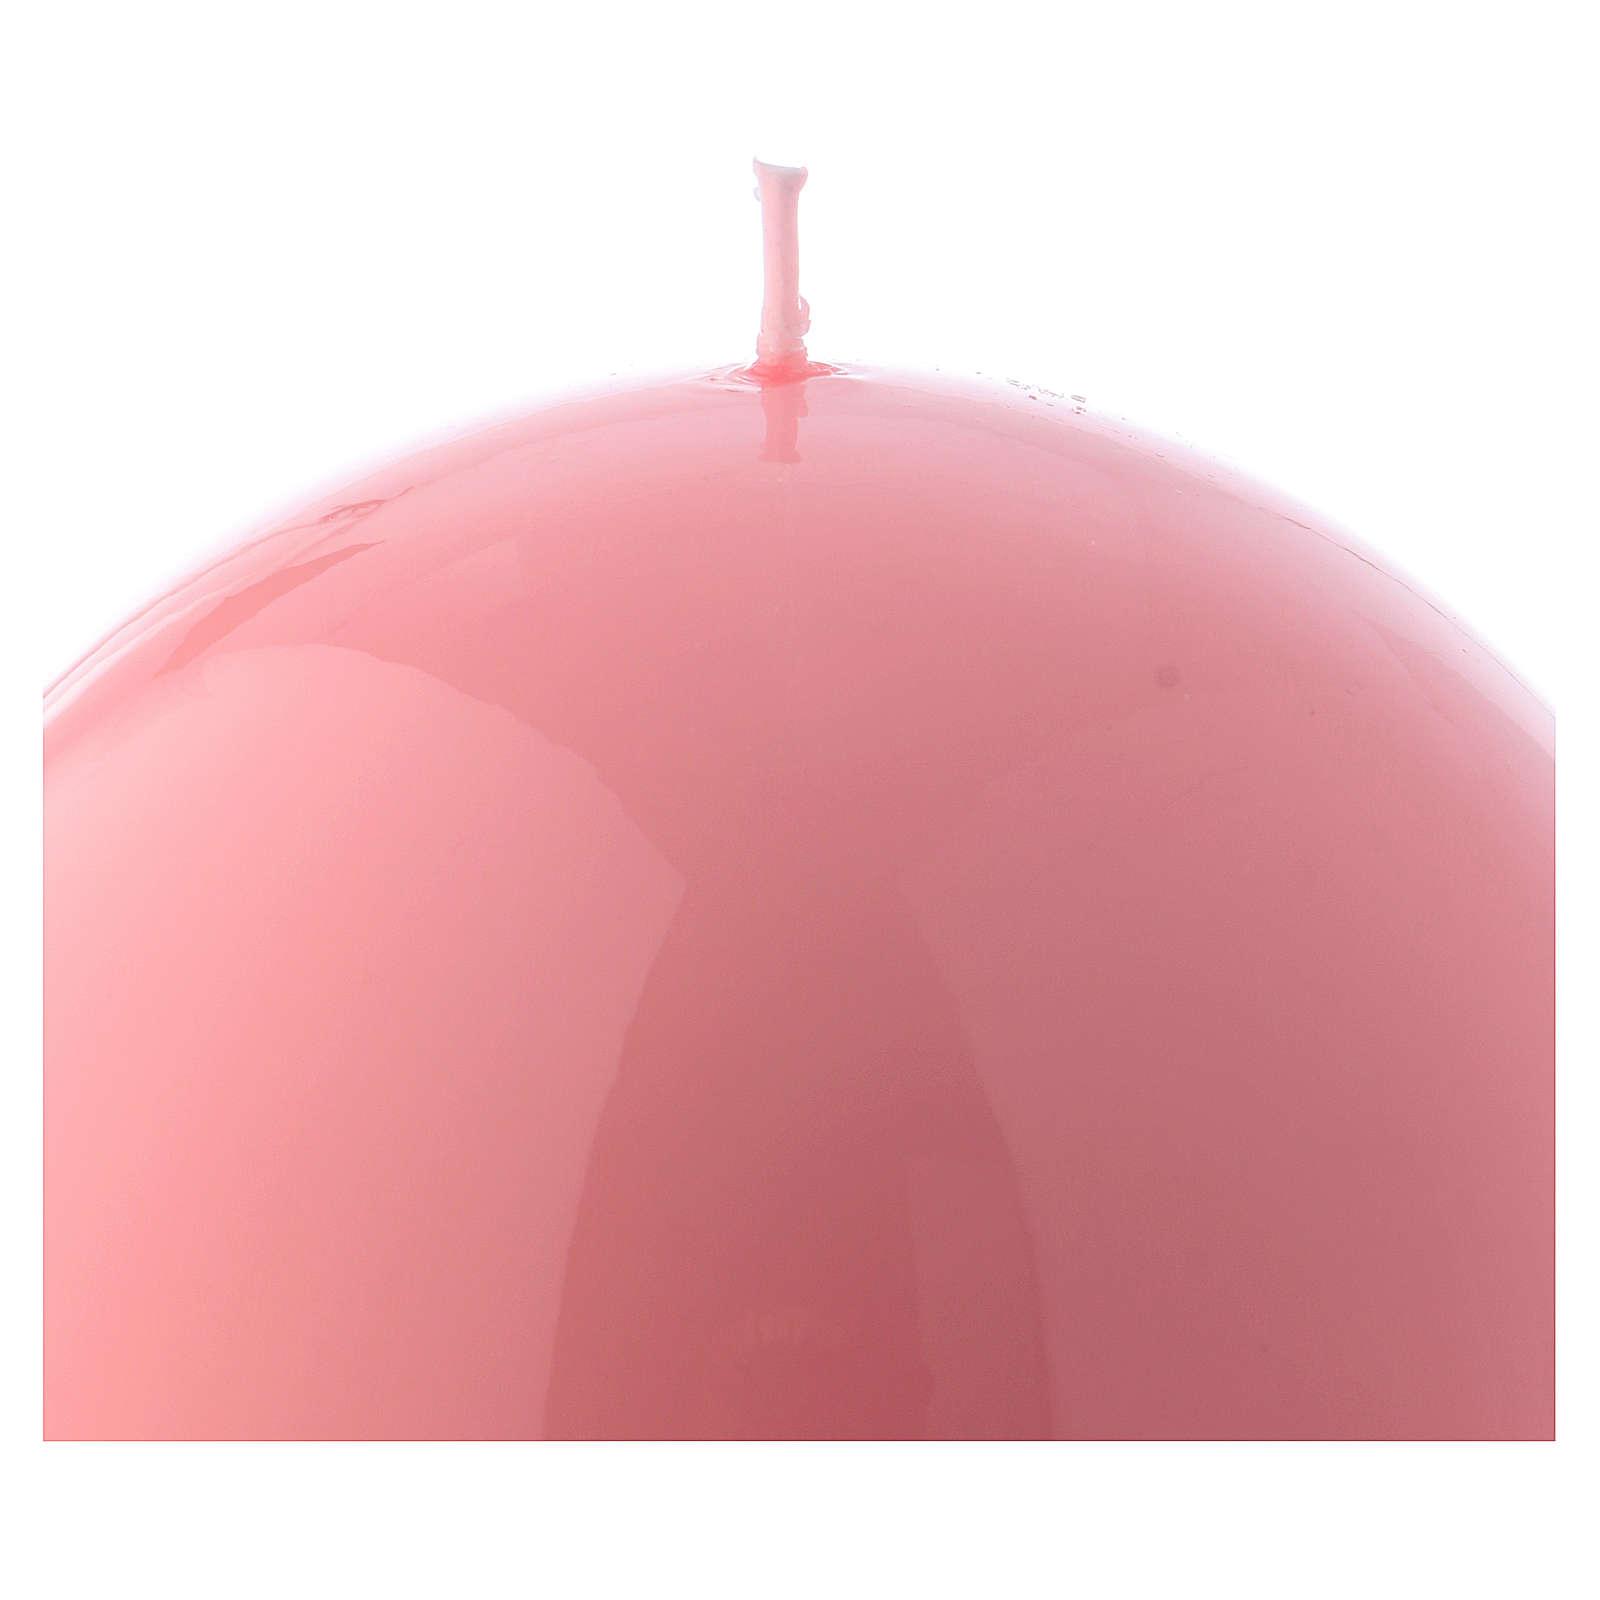 Bougie Sphère Brillante Ceralacca diam. 12 cm rose 3